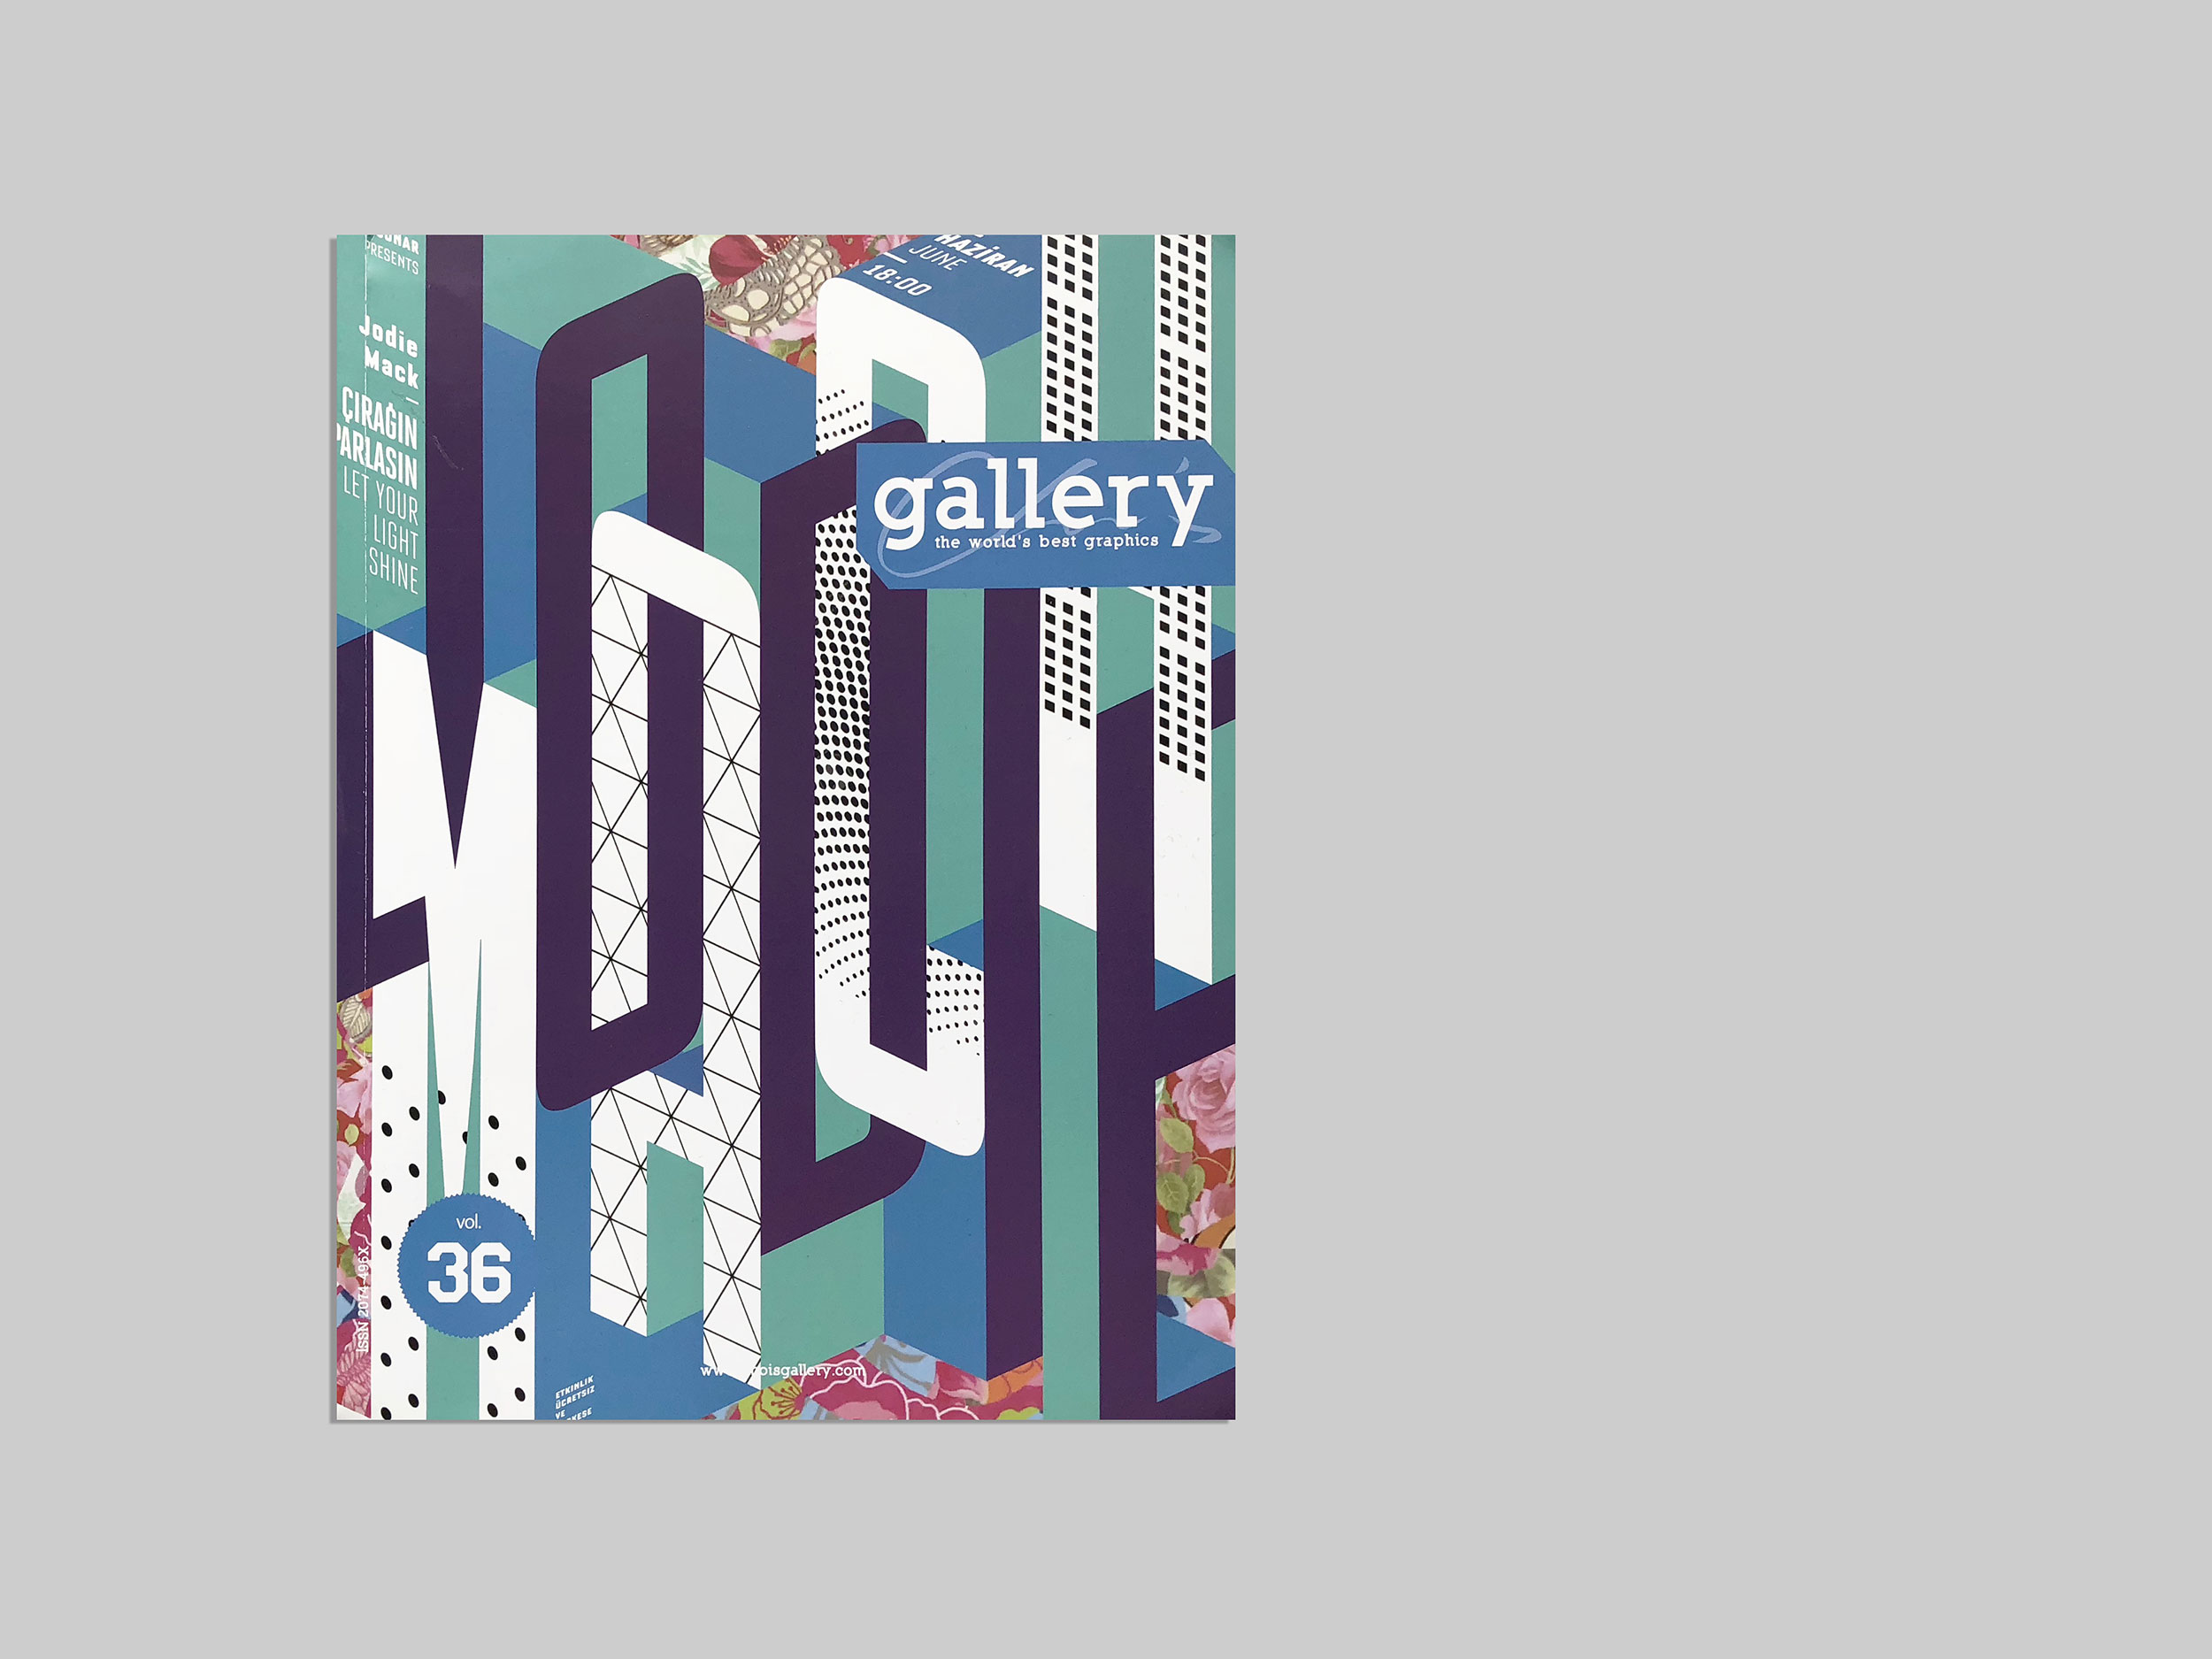 makebardo_Chois_Gallery_Magazine_Vol36_01.jpg